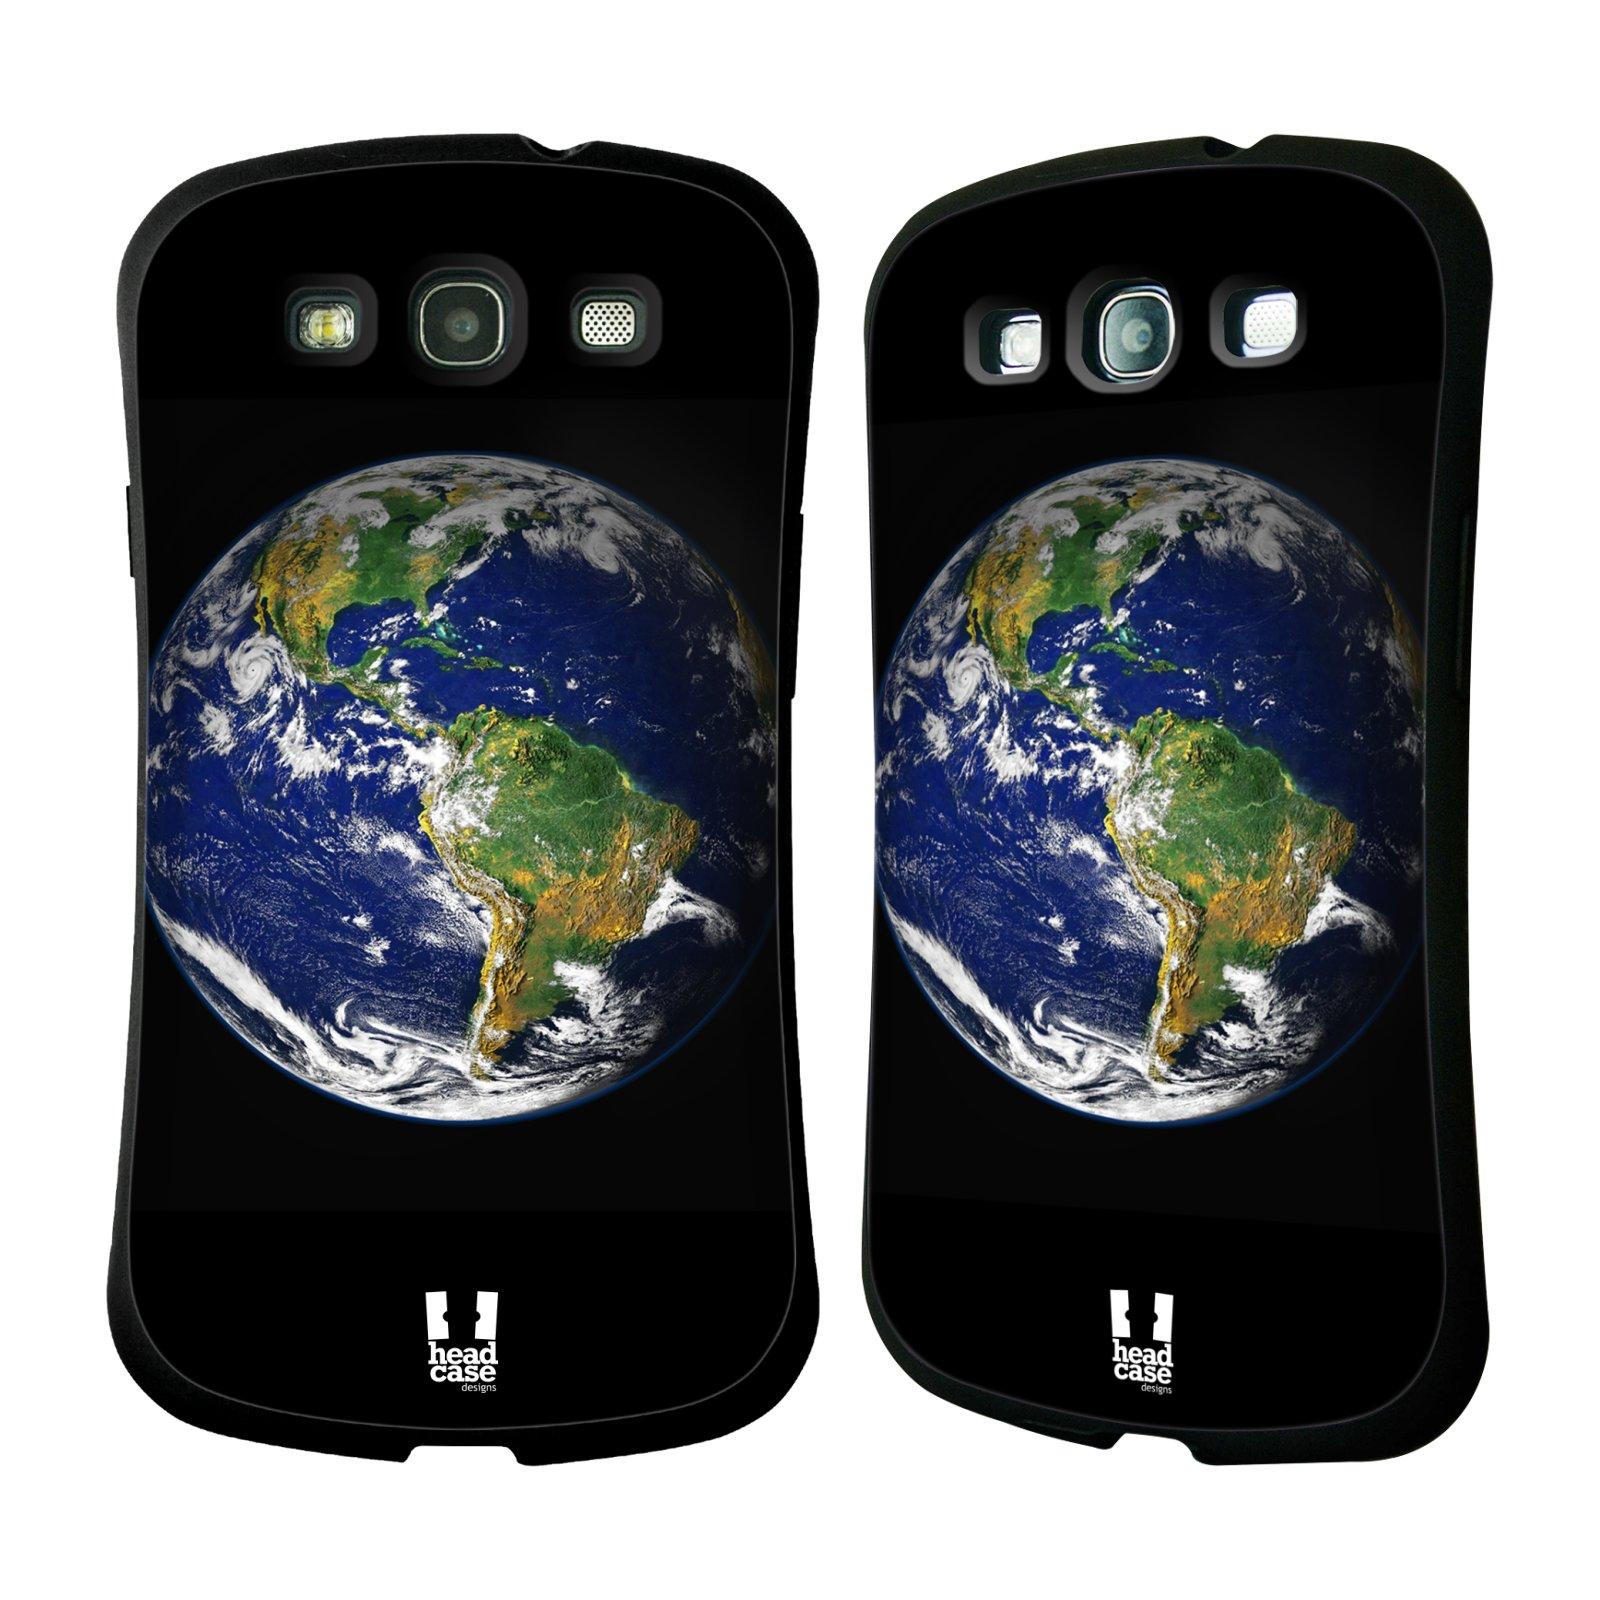 HEAD CASE silikon/plast odolný obal na mobil Samsung Galaxy S3 vzor Vesmírná krása ZEMĚ